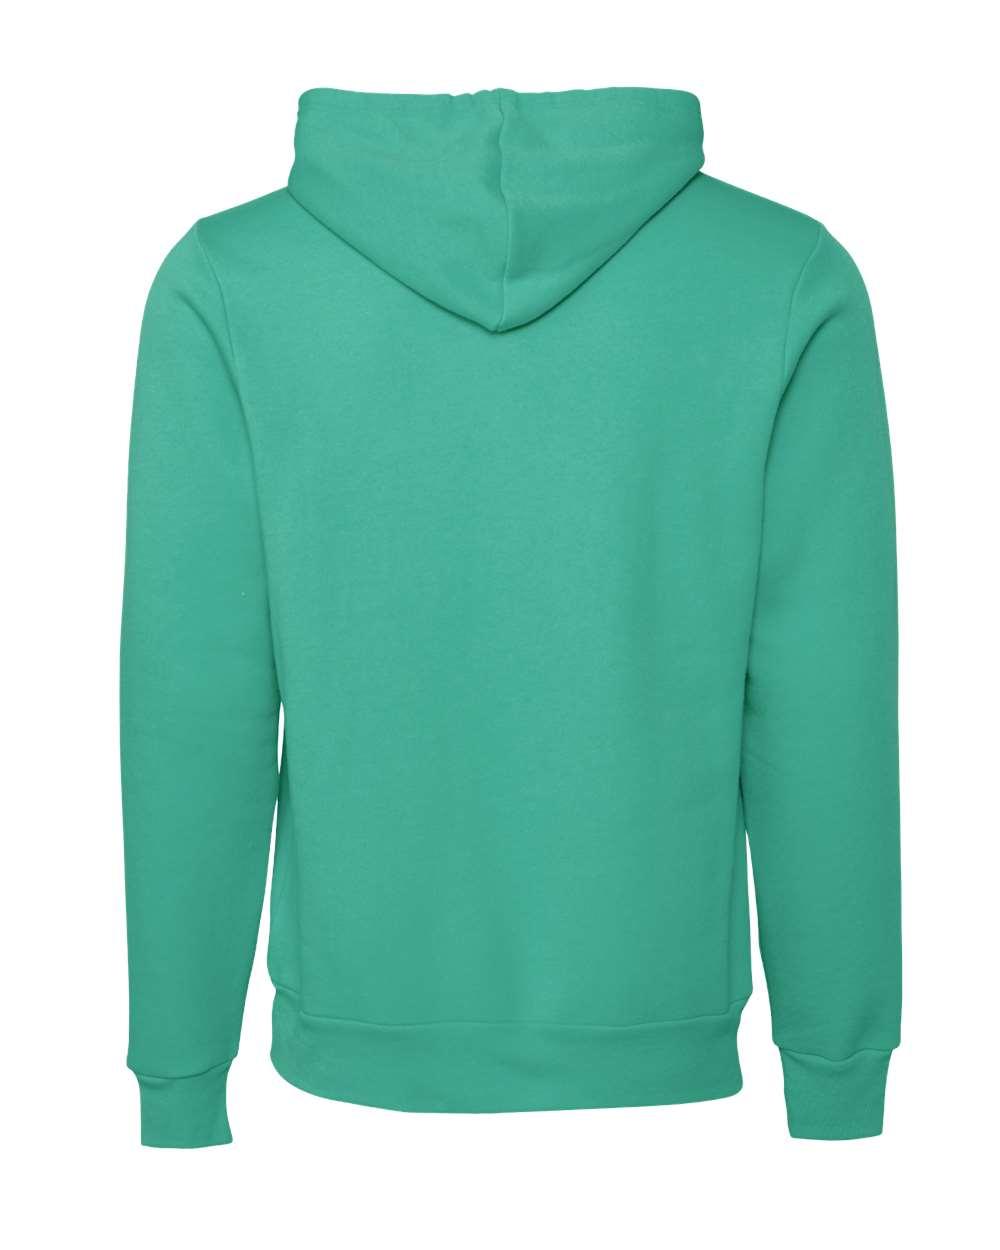 Bella-Canvas-Unisex-Sponge-Hooded-Pullover-Sweatshirt-Blank-3719-up-to-2XL thumbnail 93